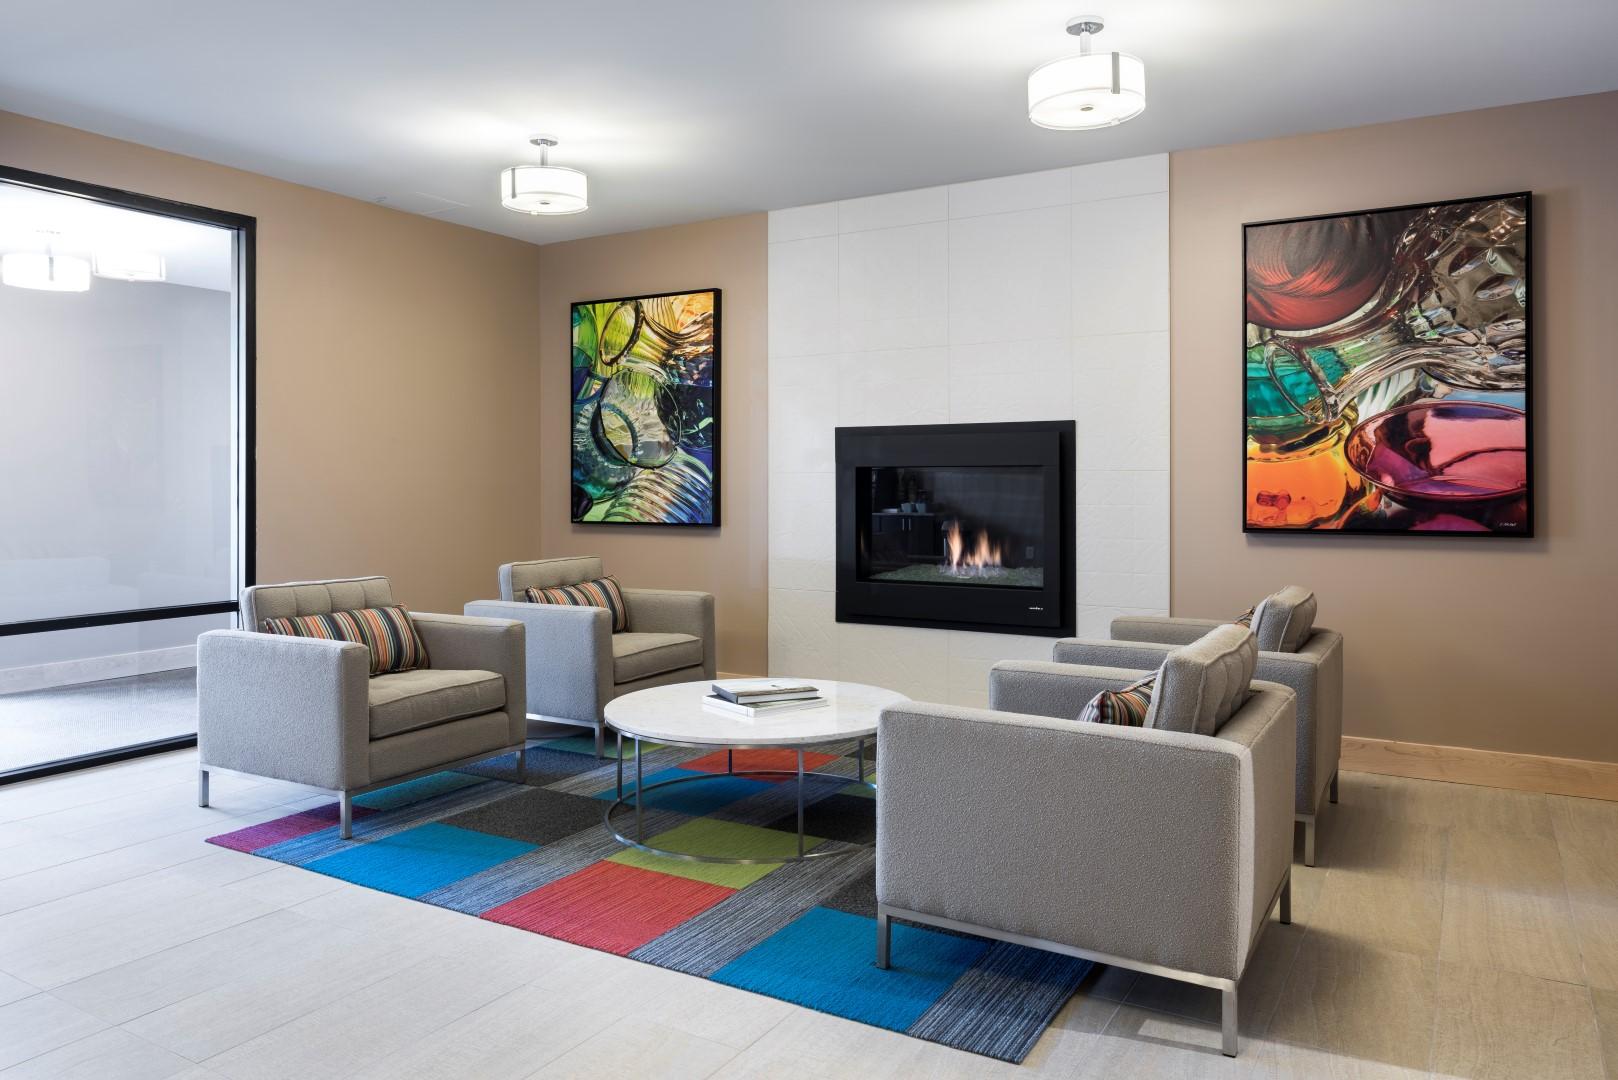 Elements-of-Linden-Hills-Apartment-Minneapolis-Minnesota-Interior13 (Large).jpg